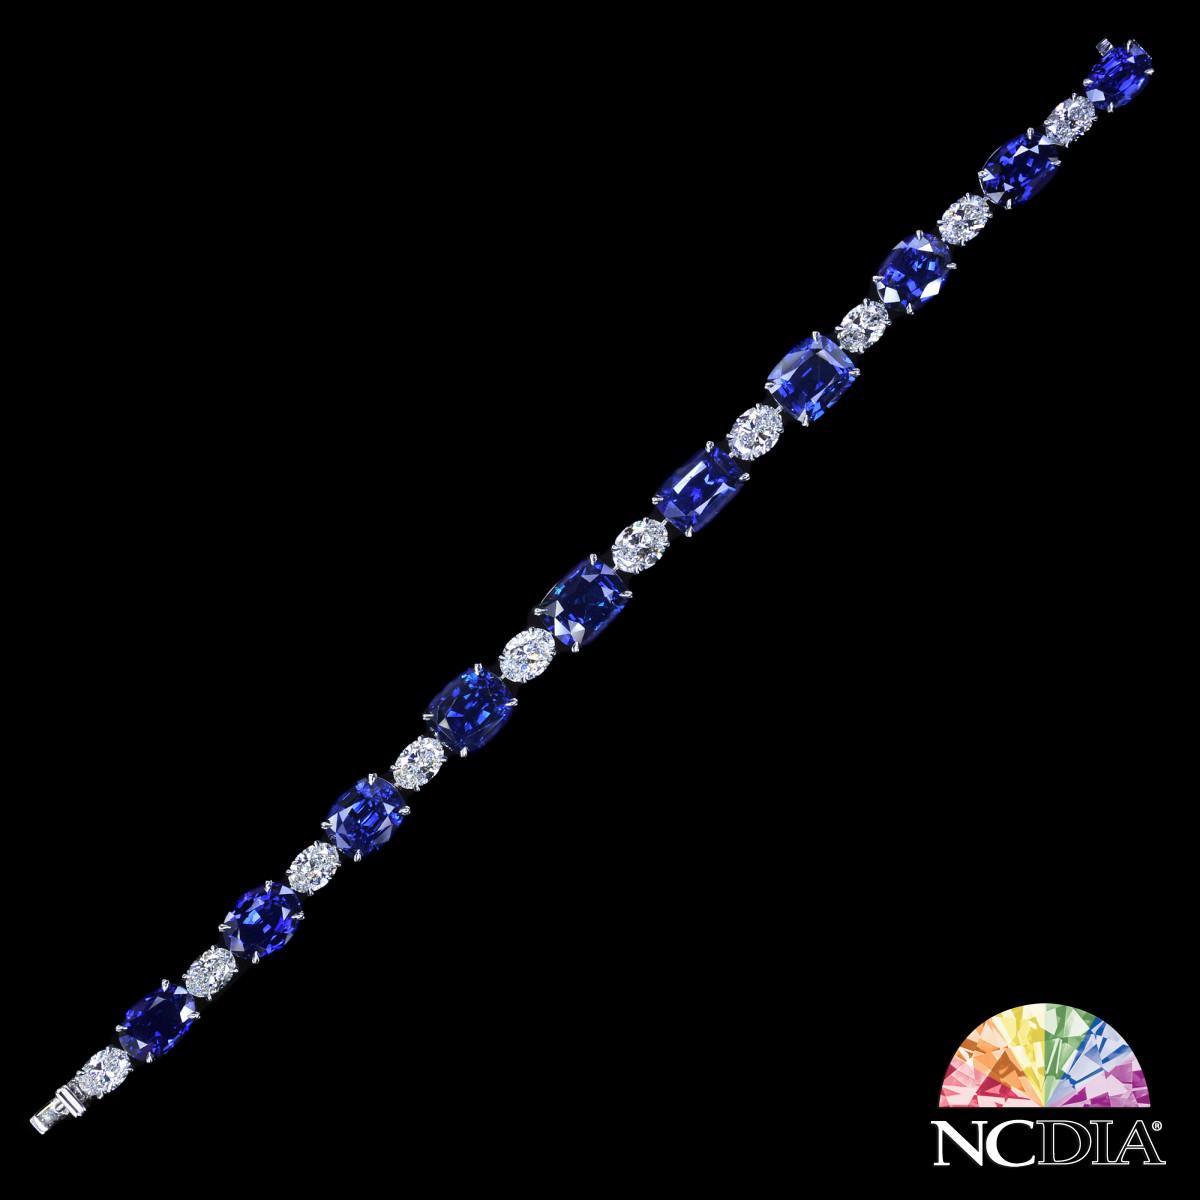 Sri Lanka Royal Blue Sapphire Diamond Bracelet, GRS/GIA certs ava.